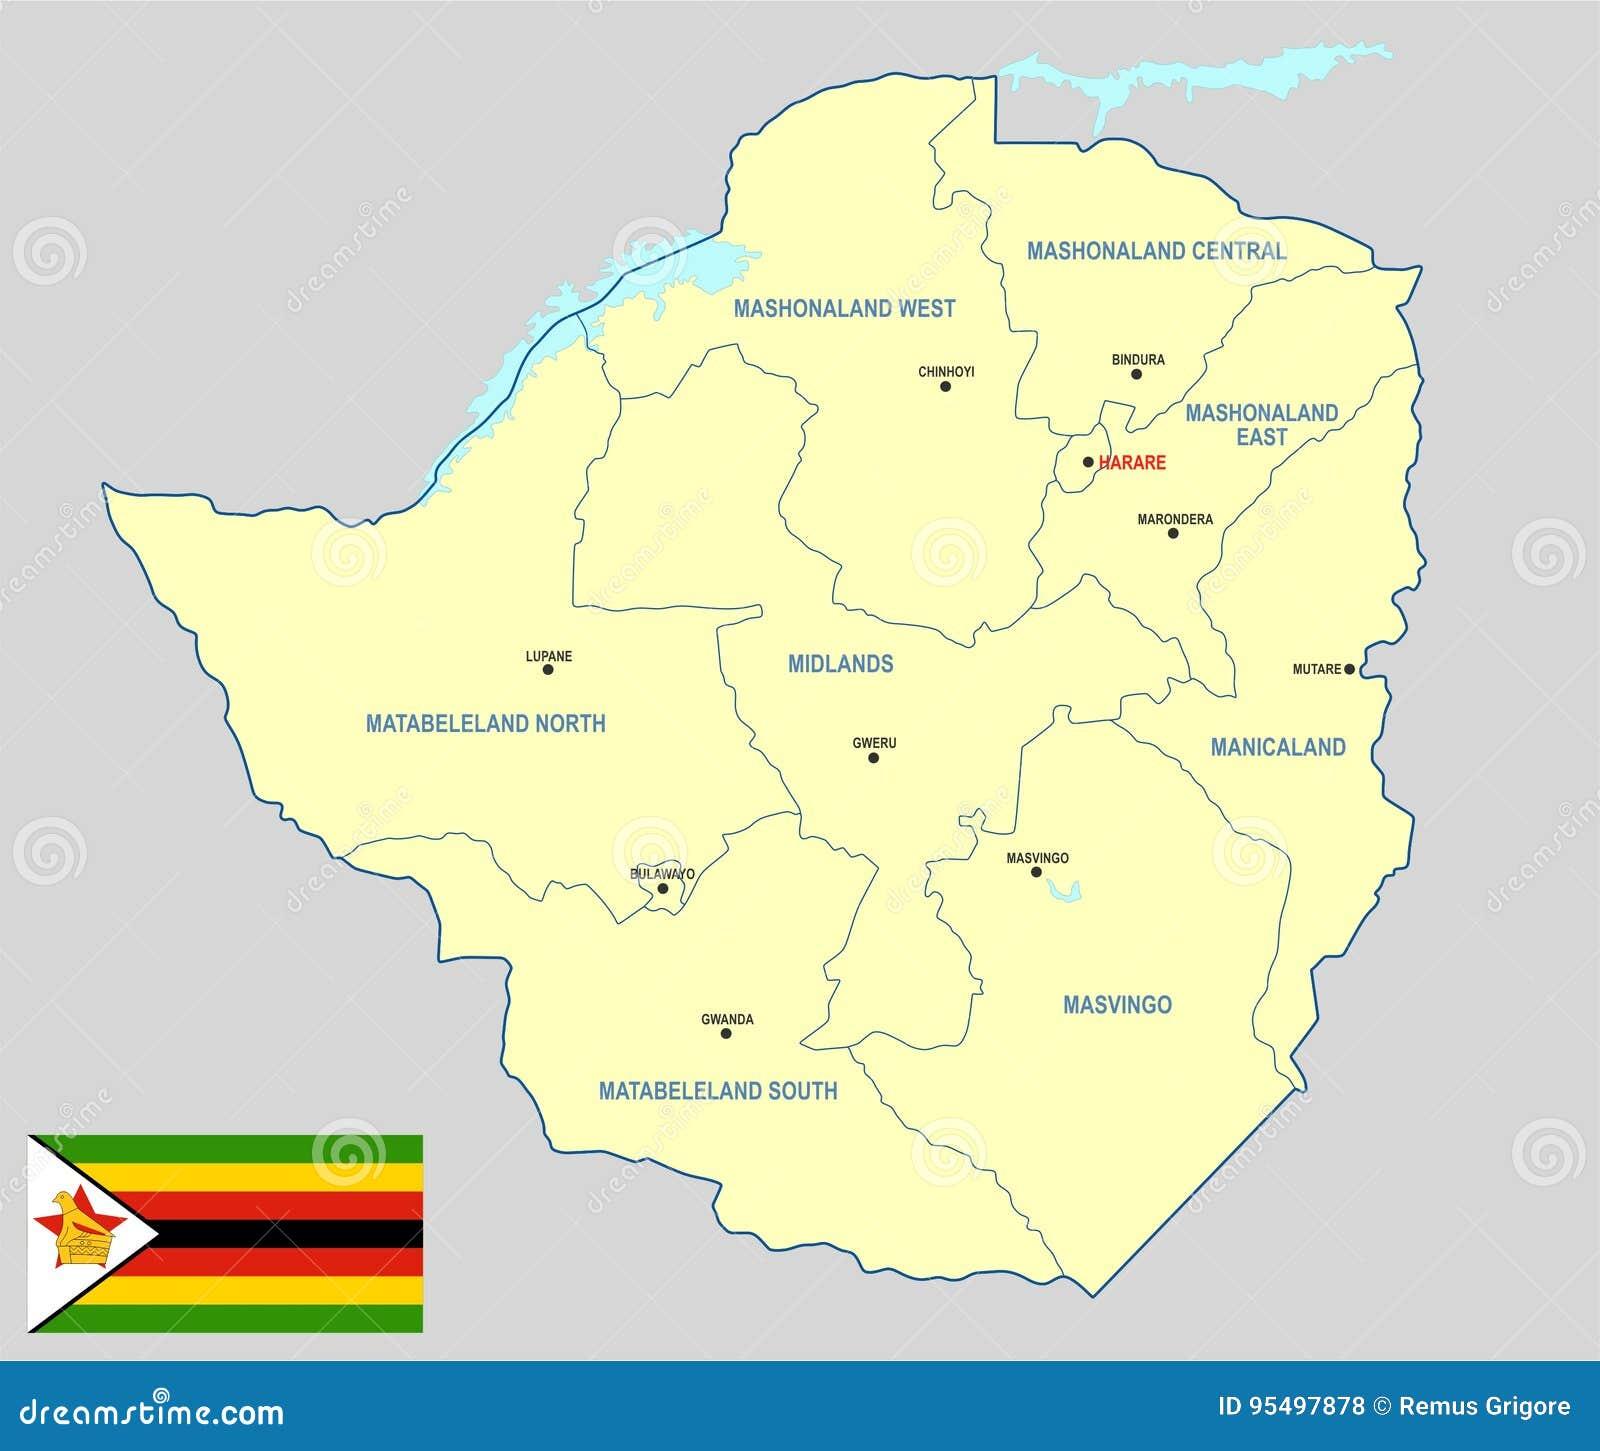 Zimbabwe map cdr format stock vector illustration of zimbabwe map cdr format gumiabroncs Image collections